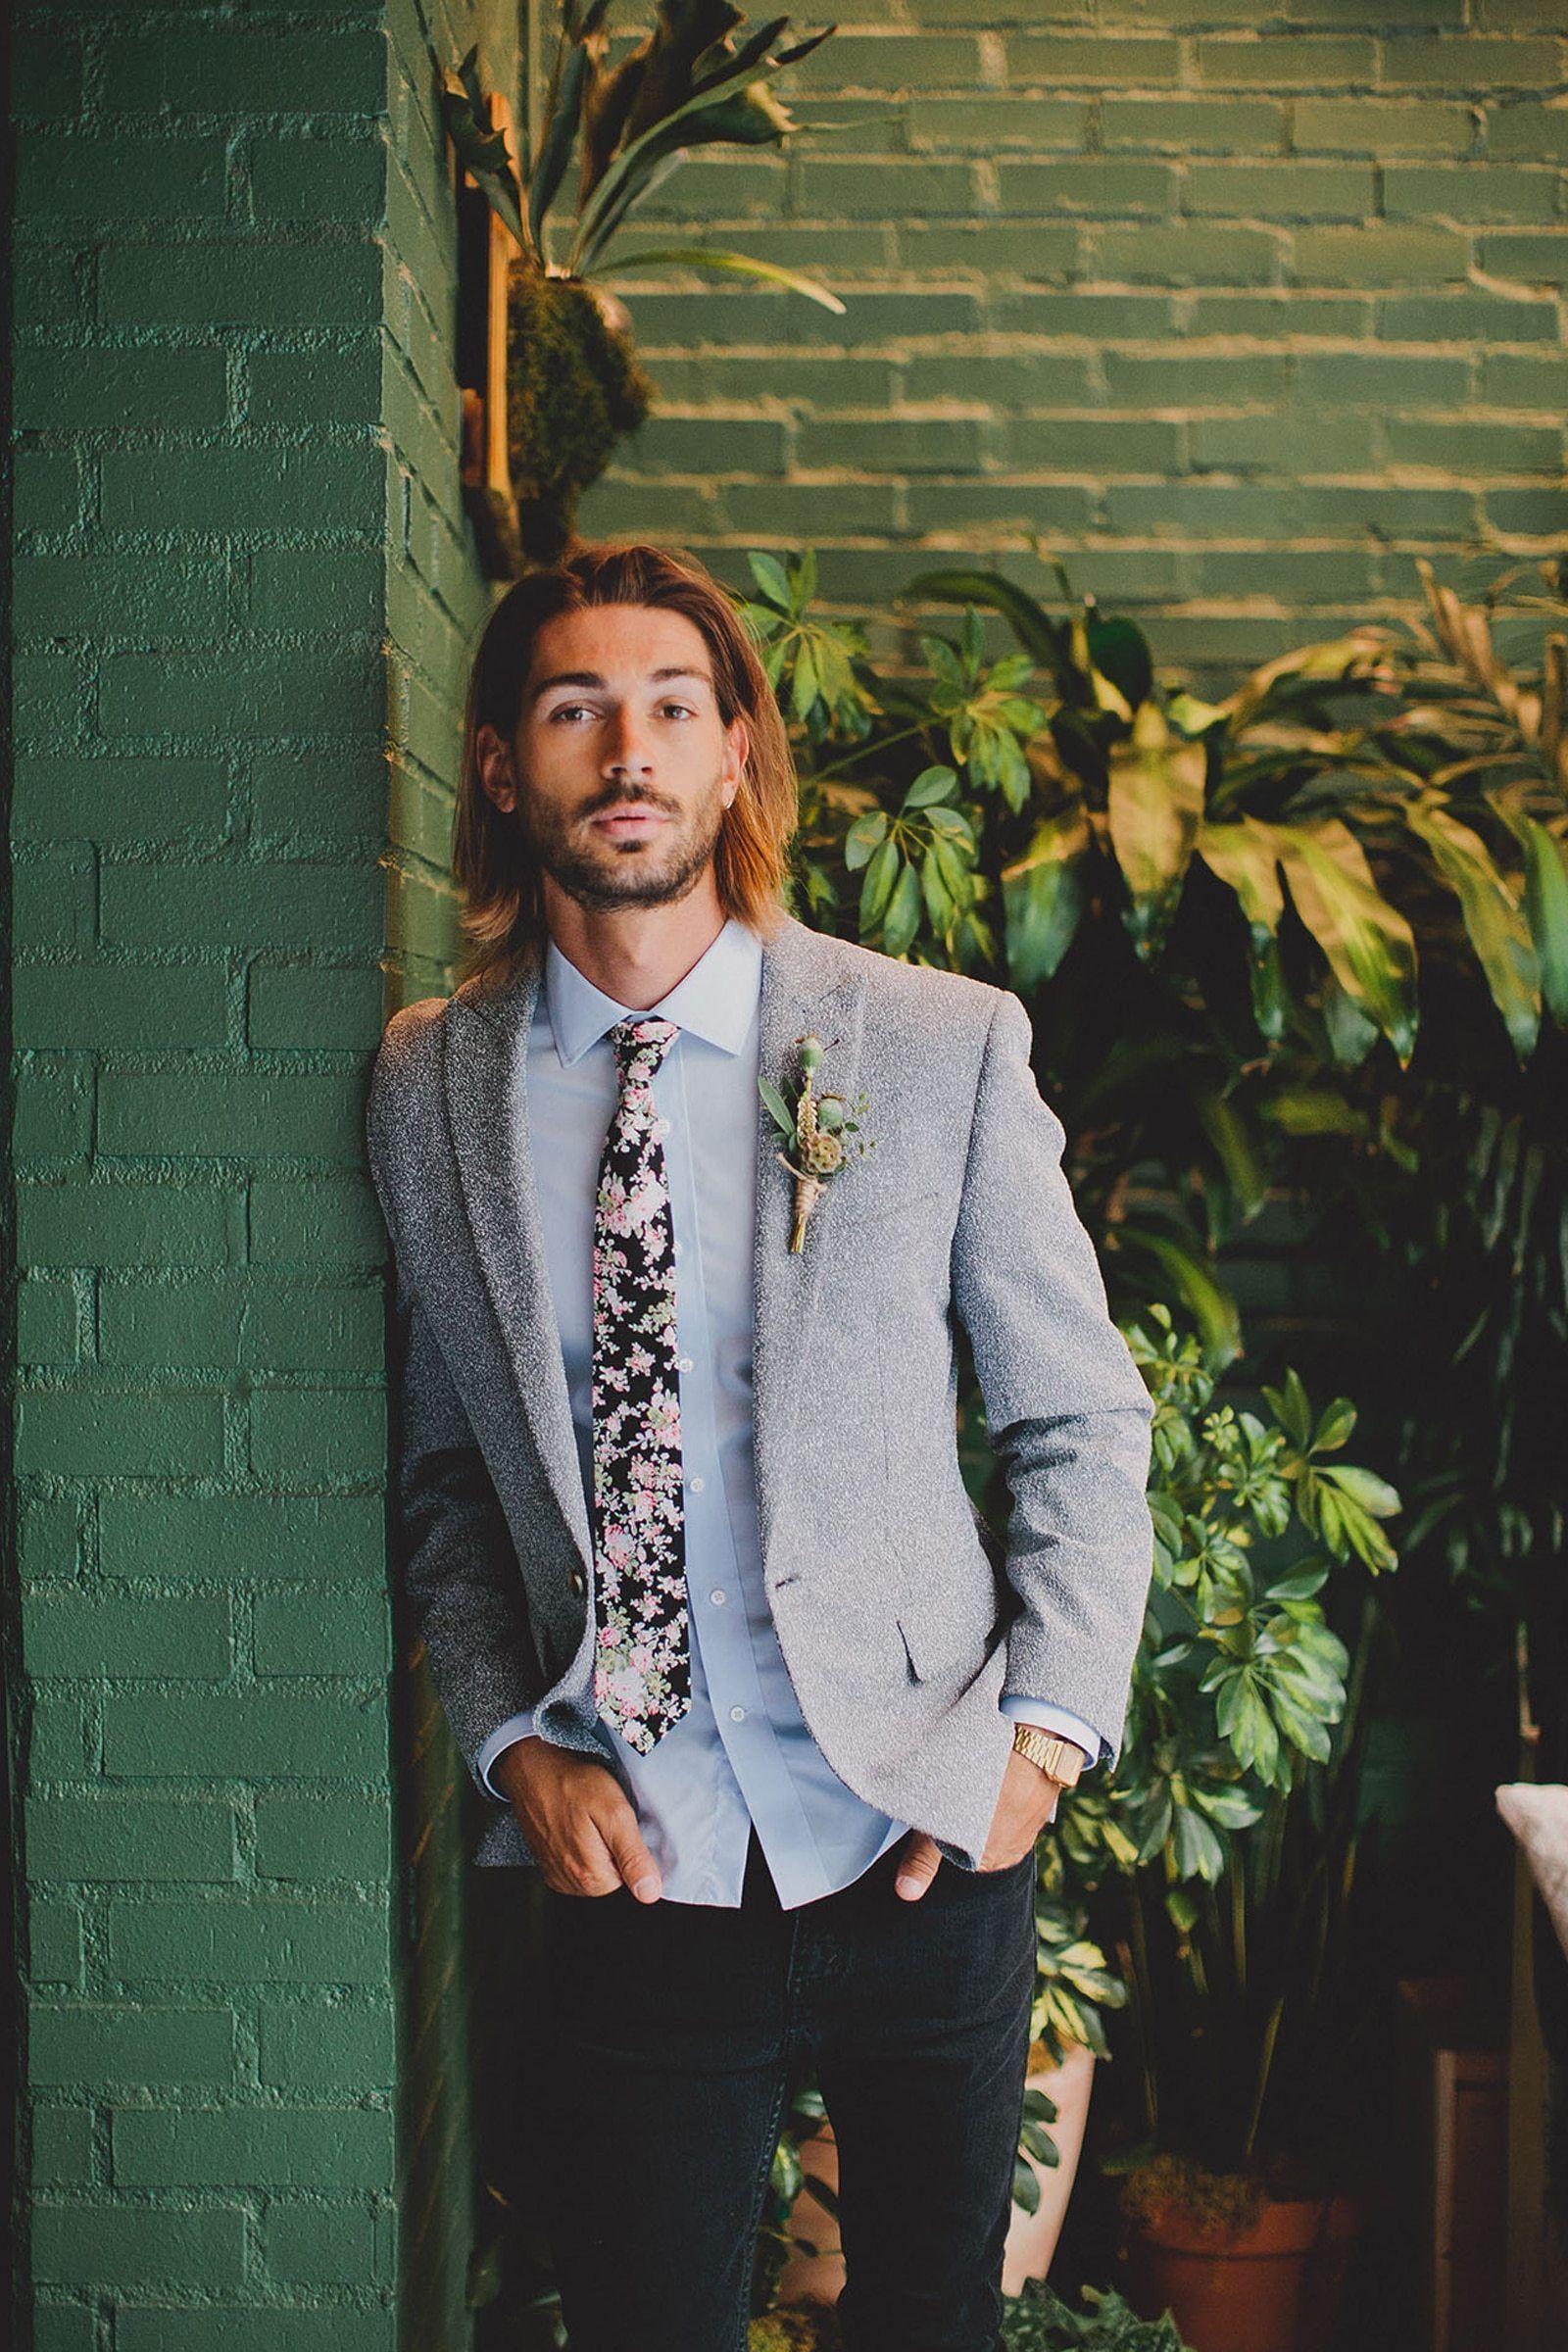 Wedding Attire For Men The Complete Guide For 2020 Casual Wedding Guest Attire Wedding Guest Outfit Summer Wedding Attire Guest